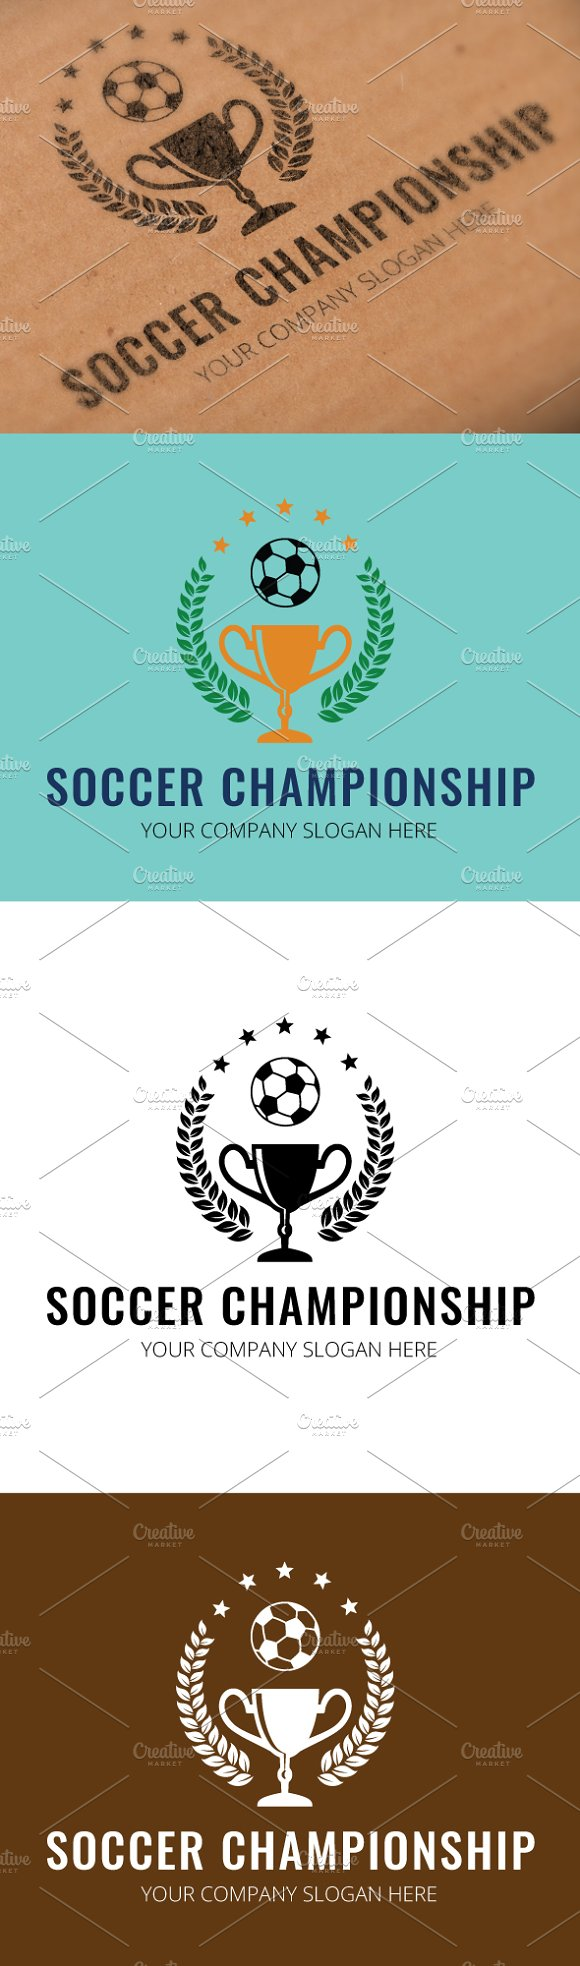 Soccer Championship Logo Template